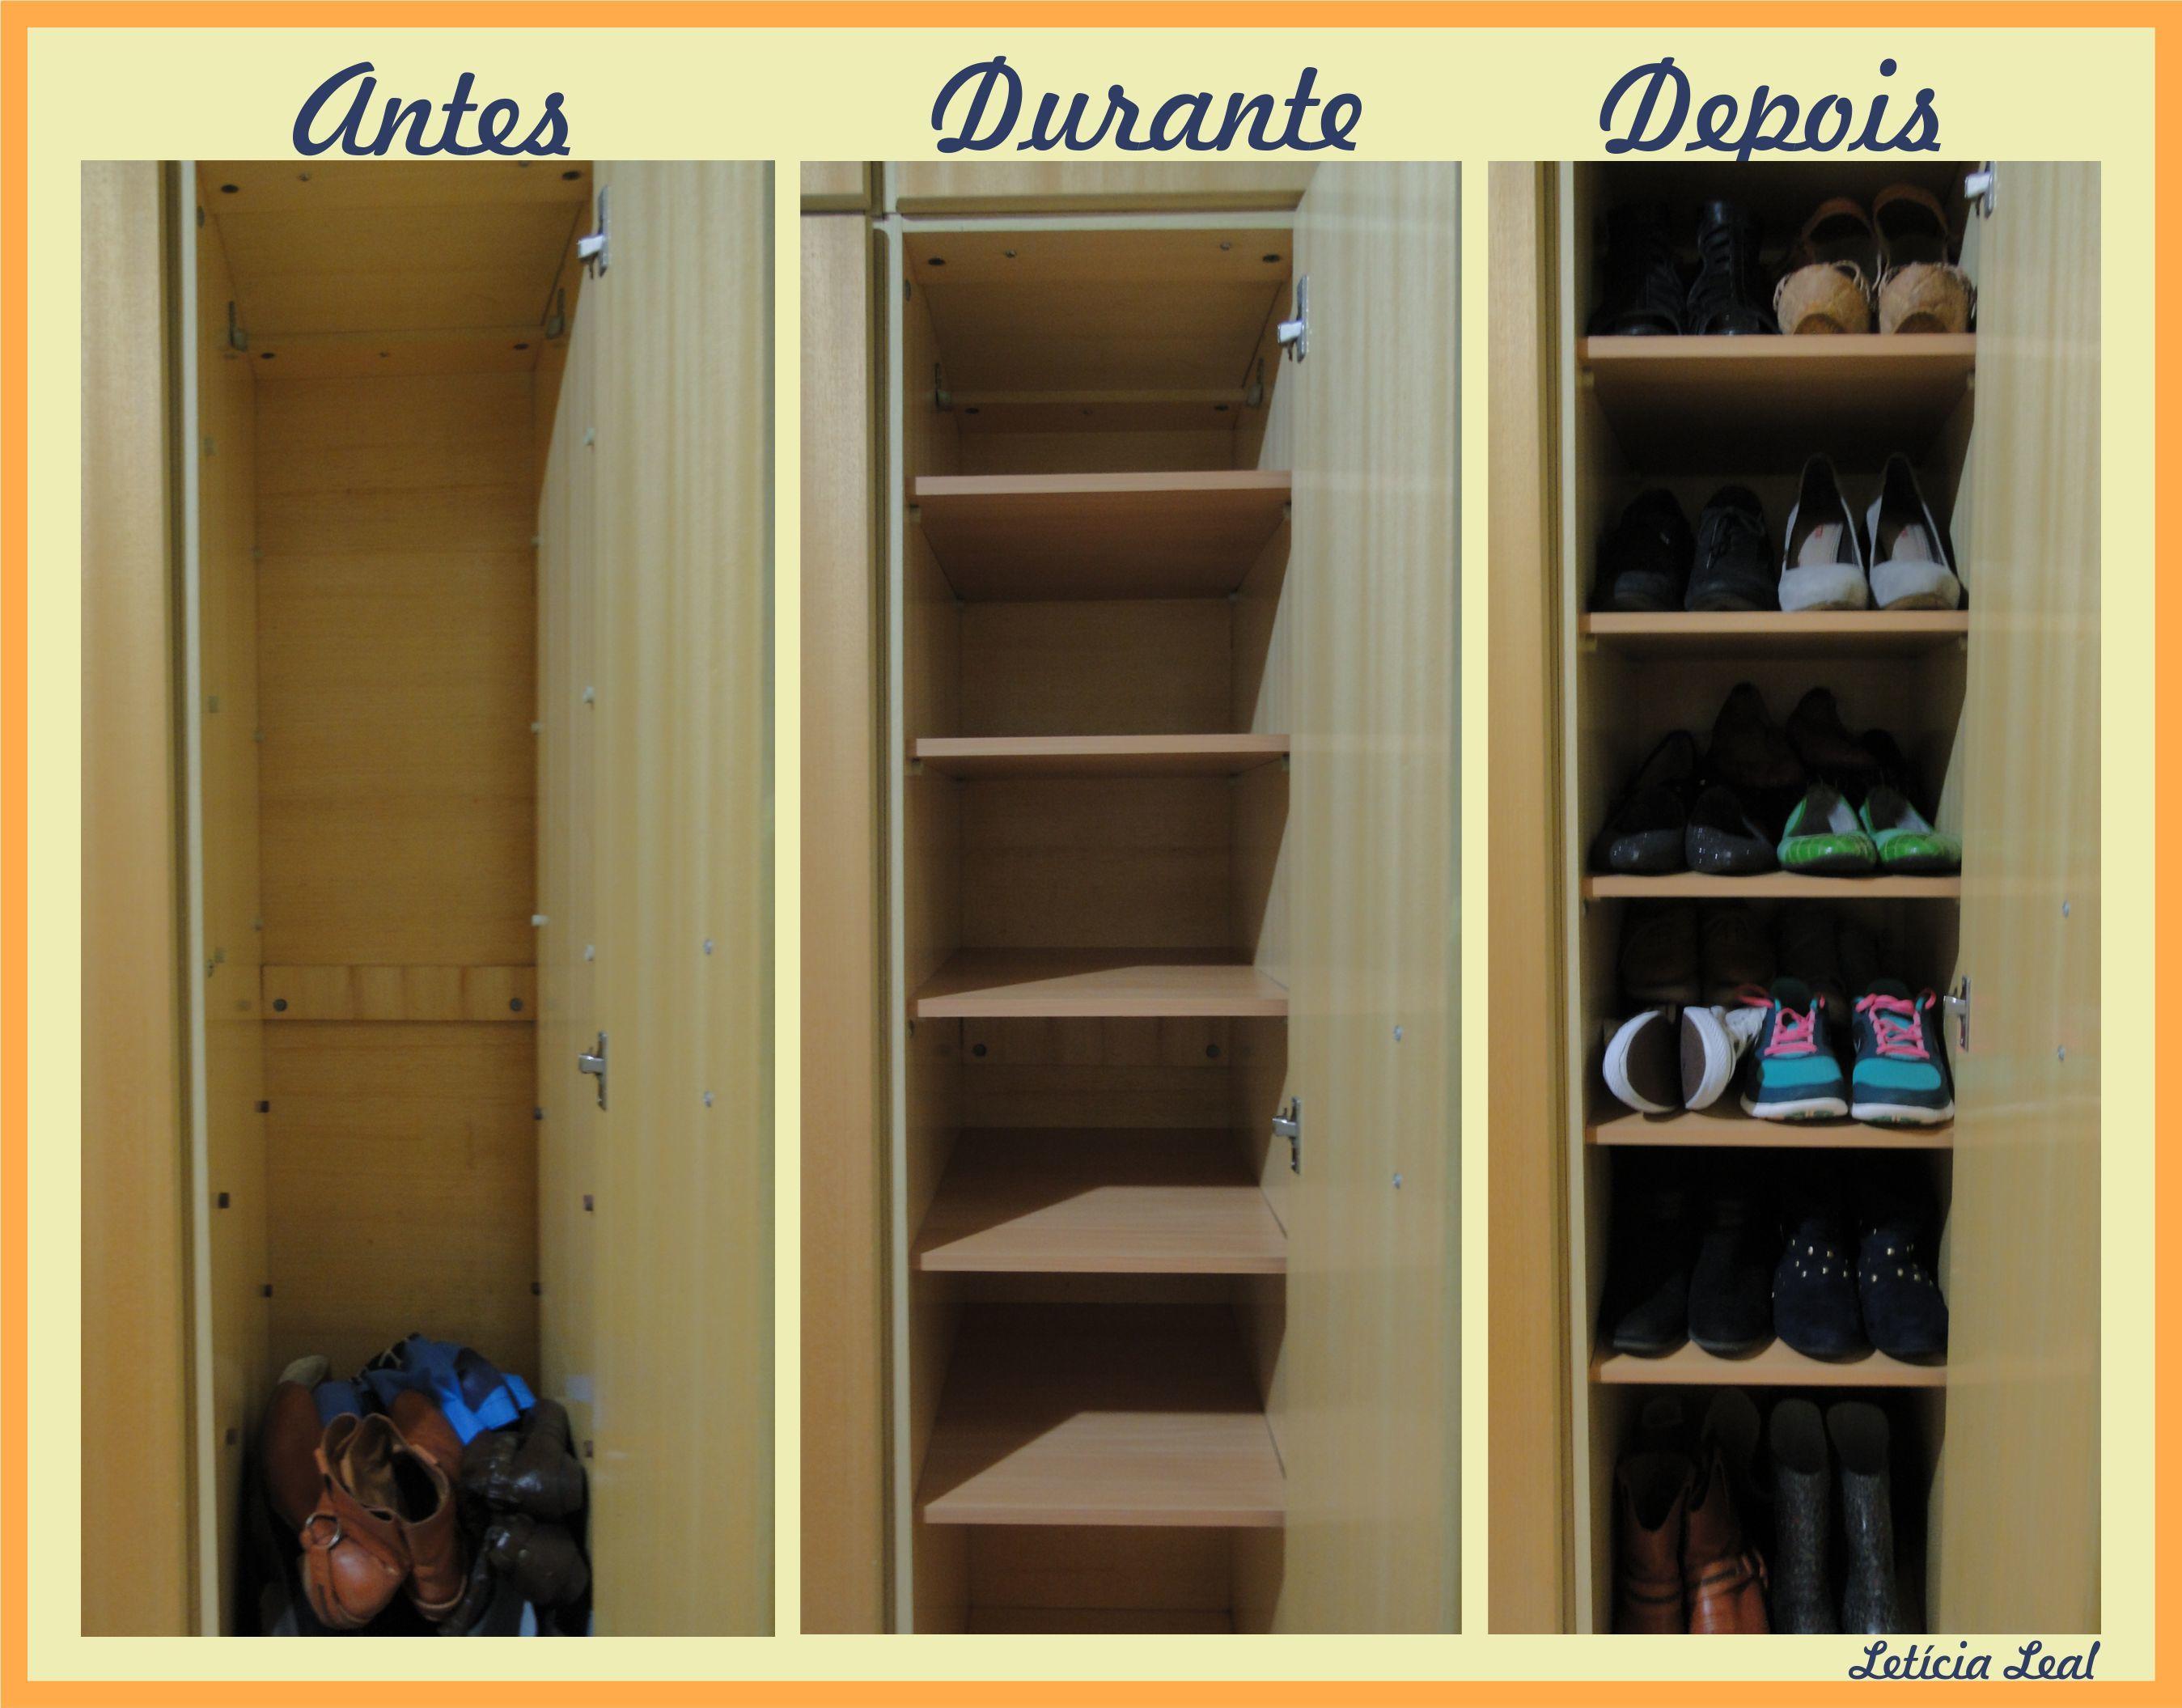 Como organizar muita roupa no guarda roupa pequeno for Como organizar un armario pequeno